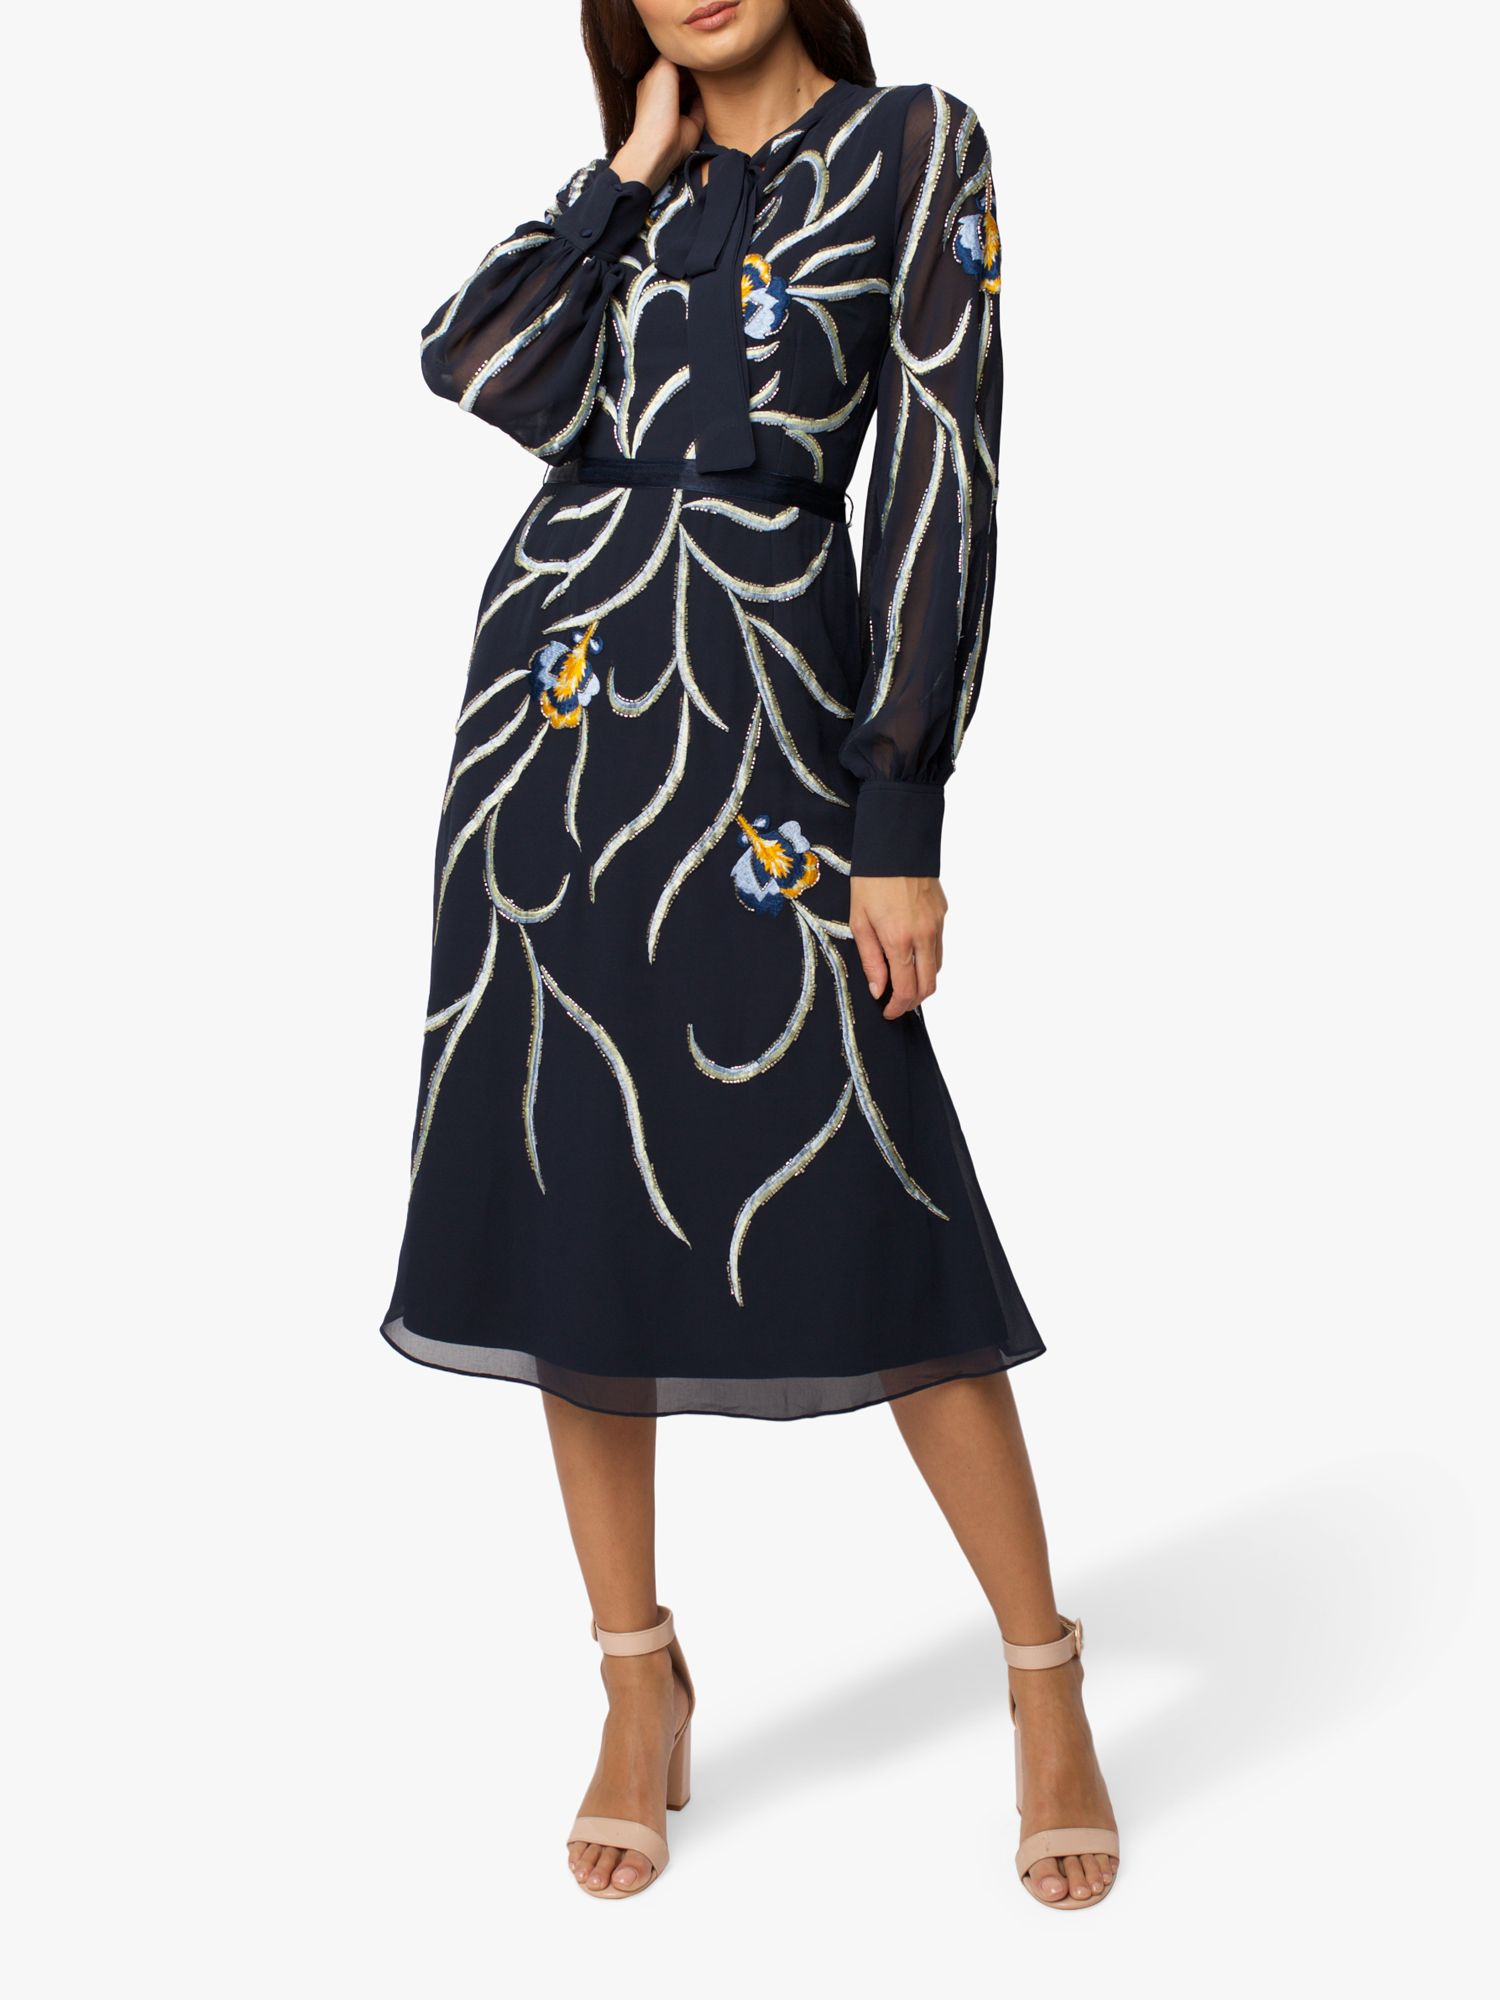 RAISHMA Raishma Dinah Embellished Midi Dress, Navy